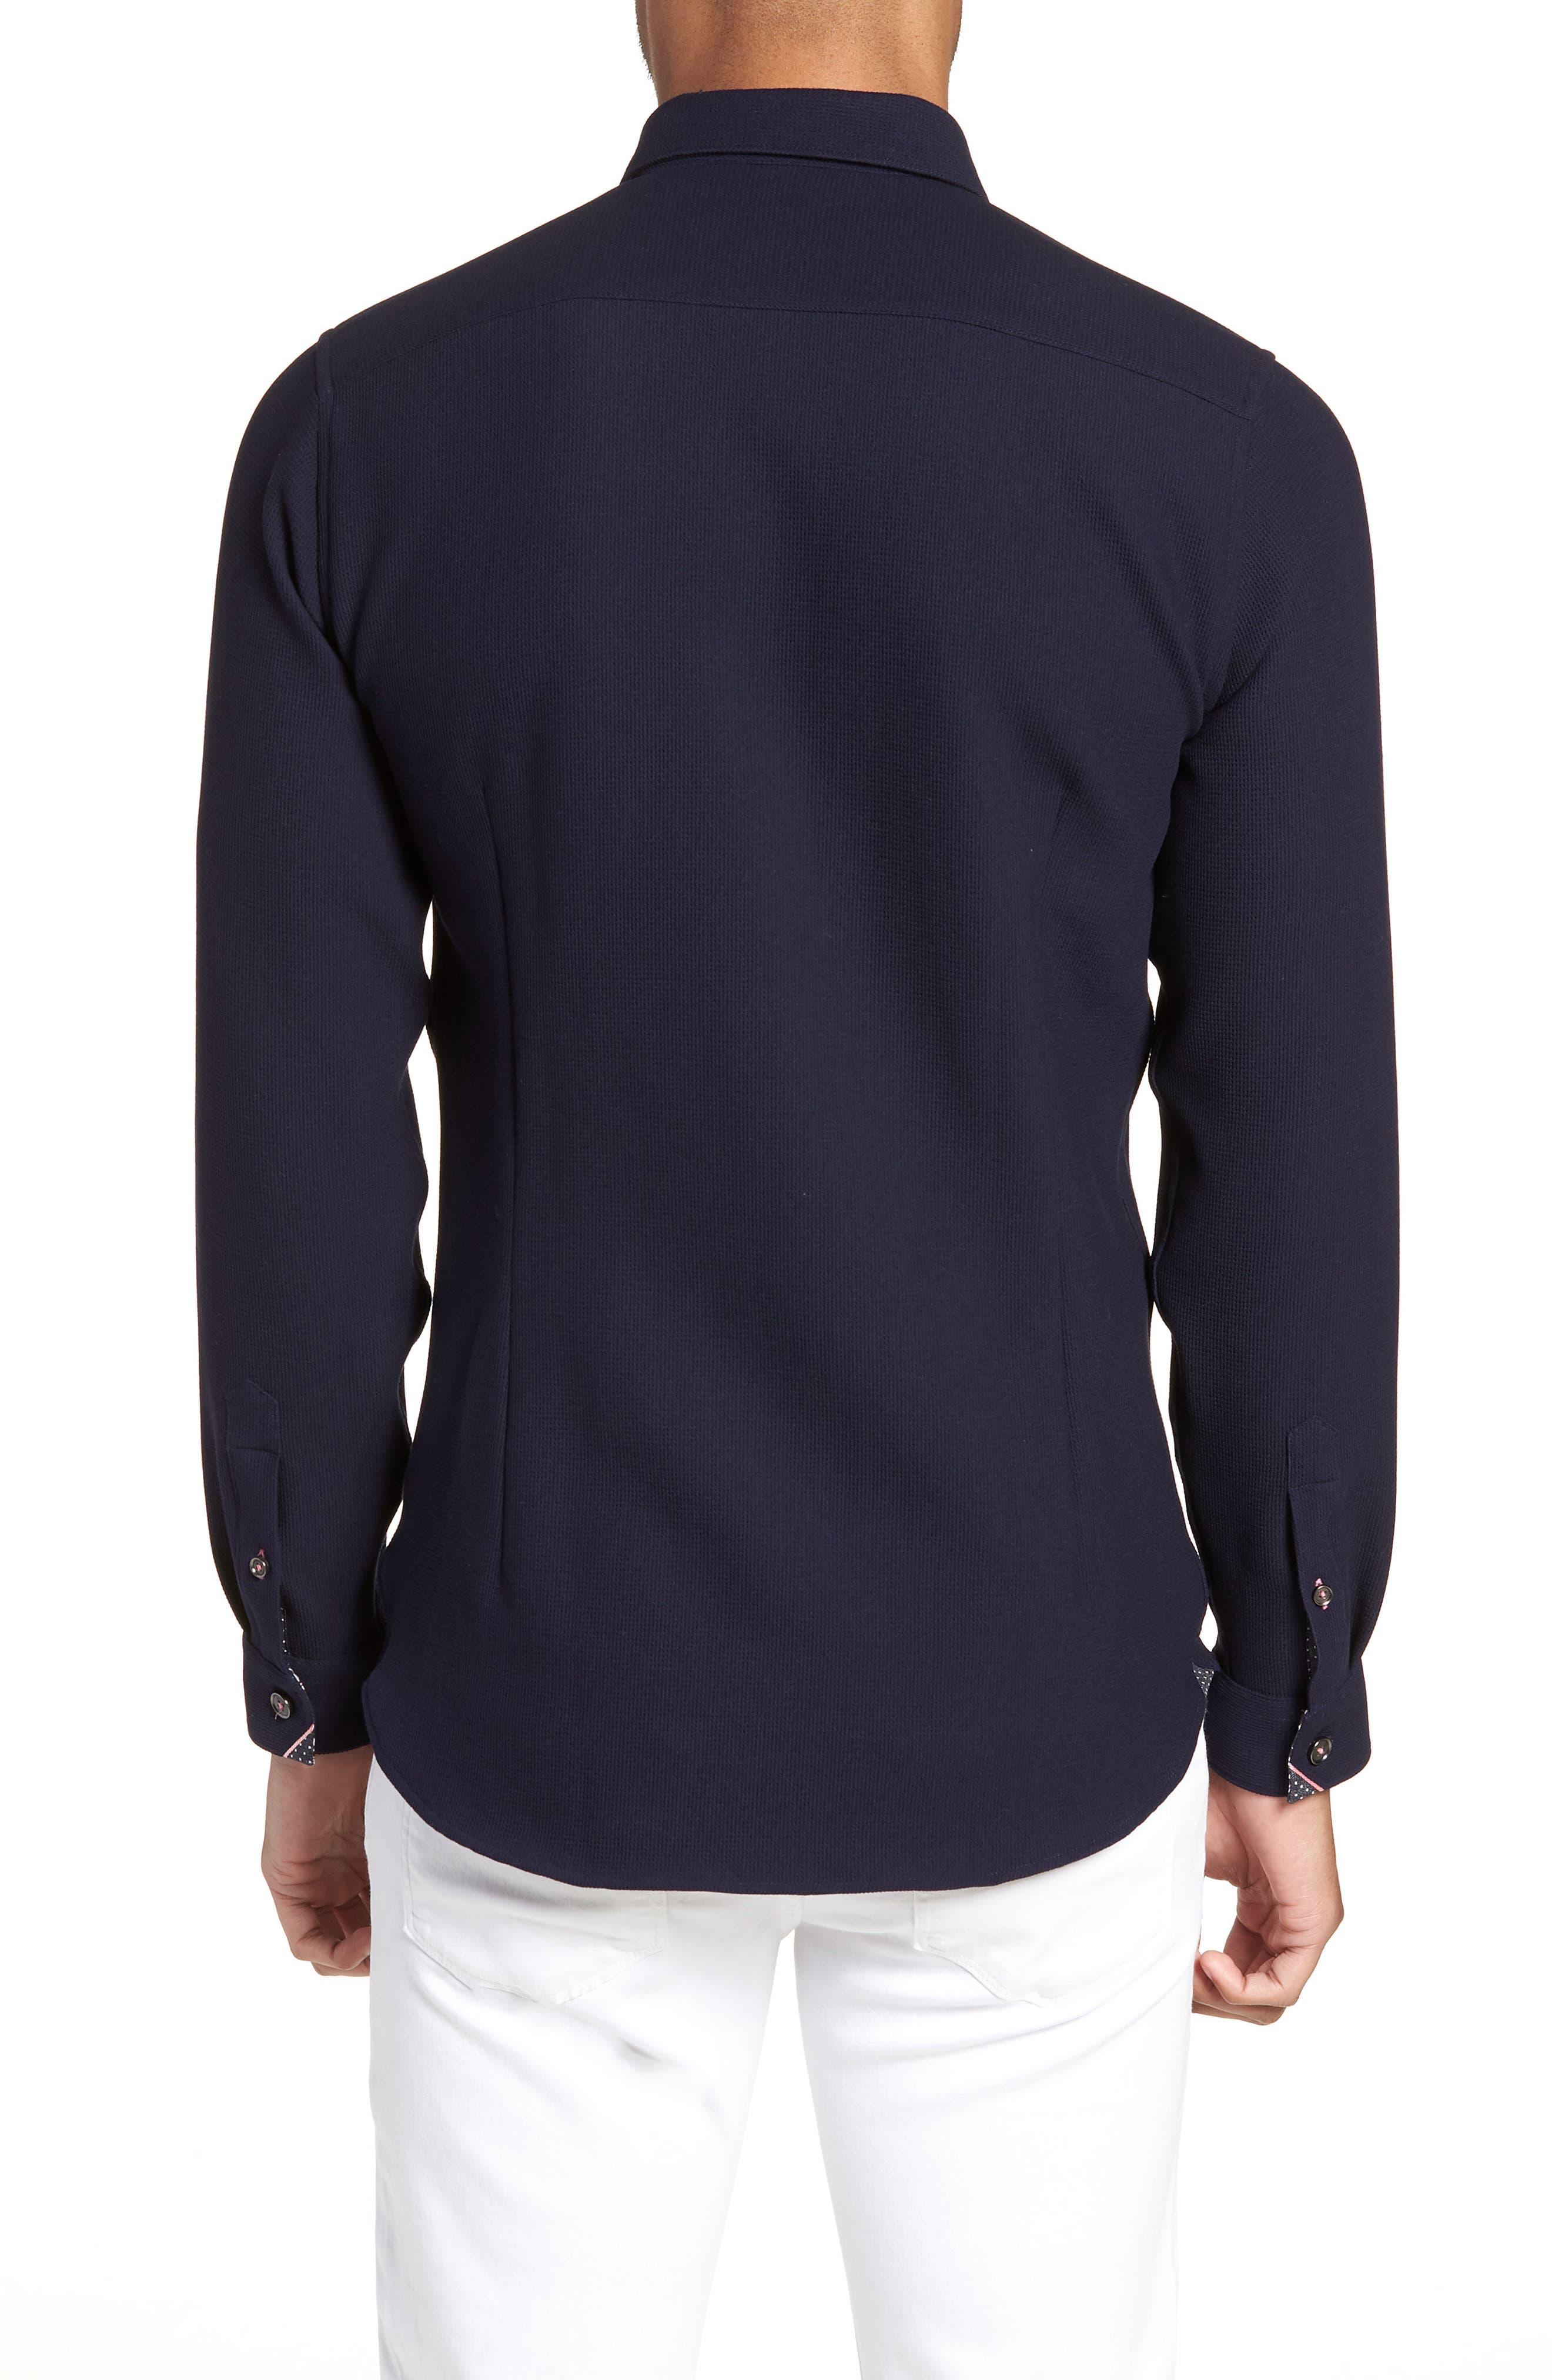 Loretax Trim Fit Stretch Knit Sport Shirt,                             Alternate thumbnail 3, color,                             Navy